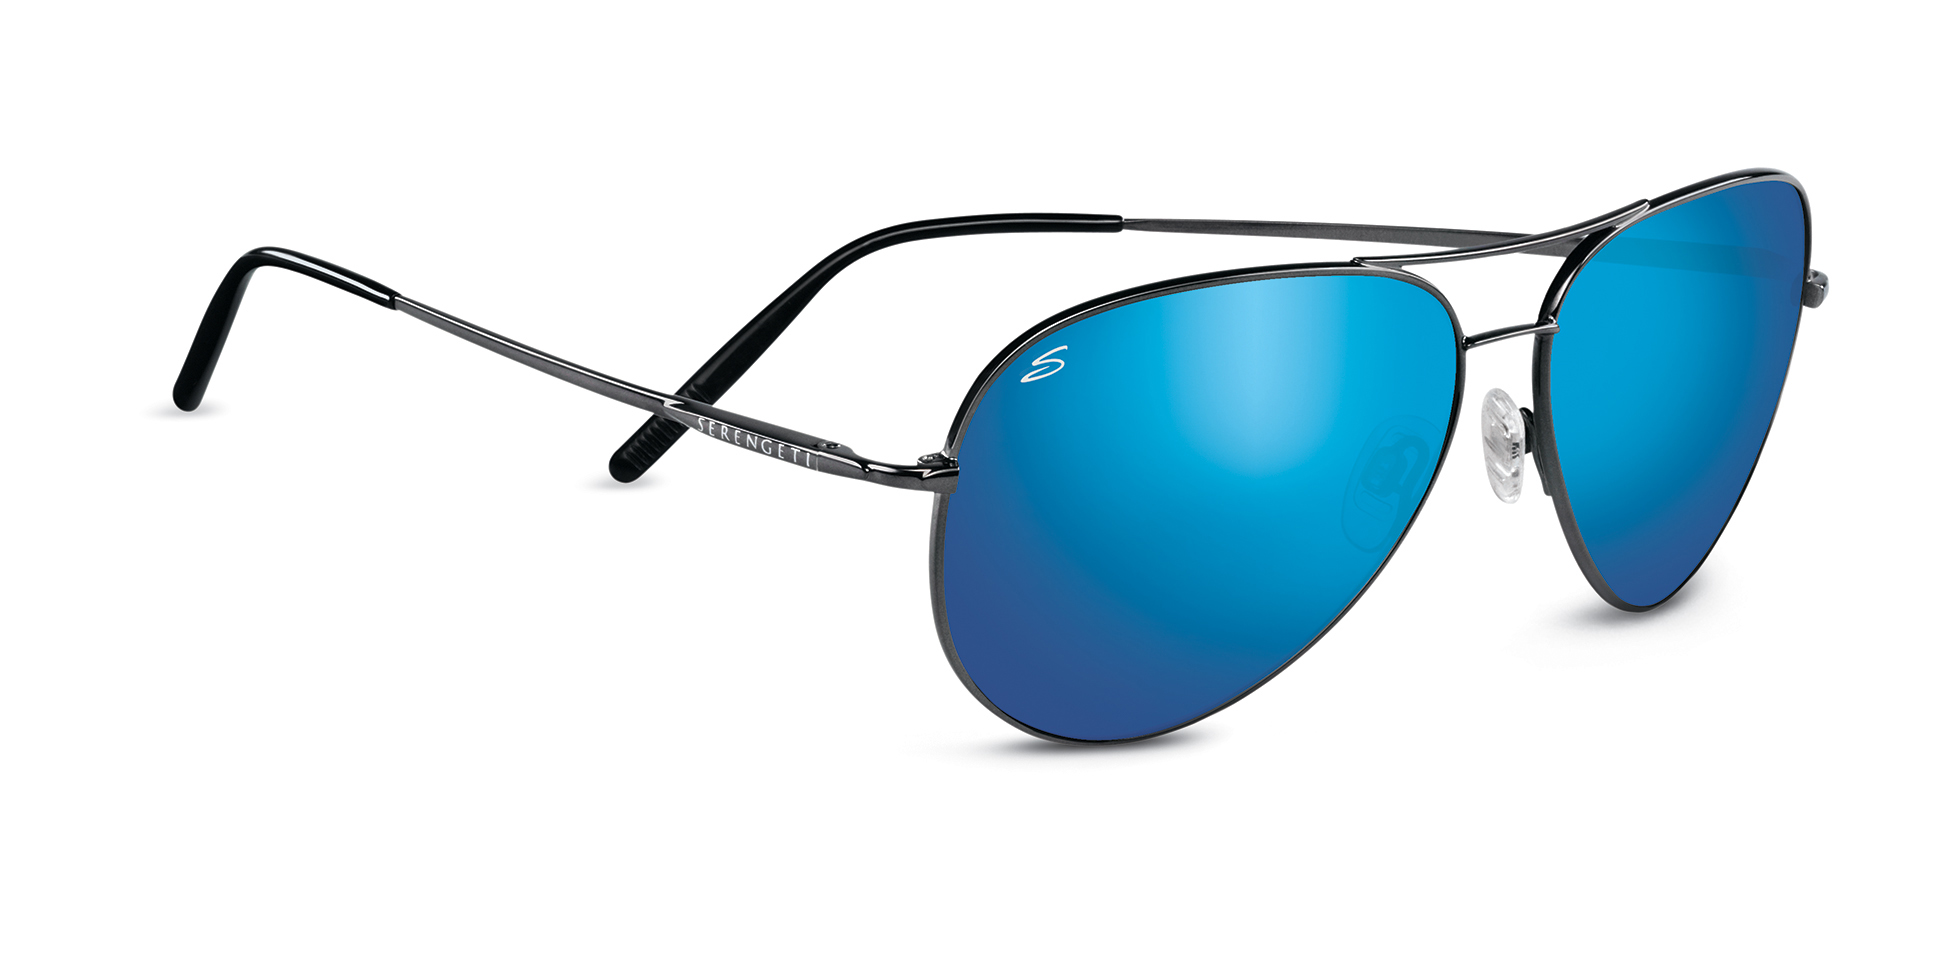 d7a5a0238b Serengeti Aviator Sunglasses FREE S H 6826